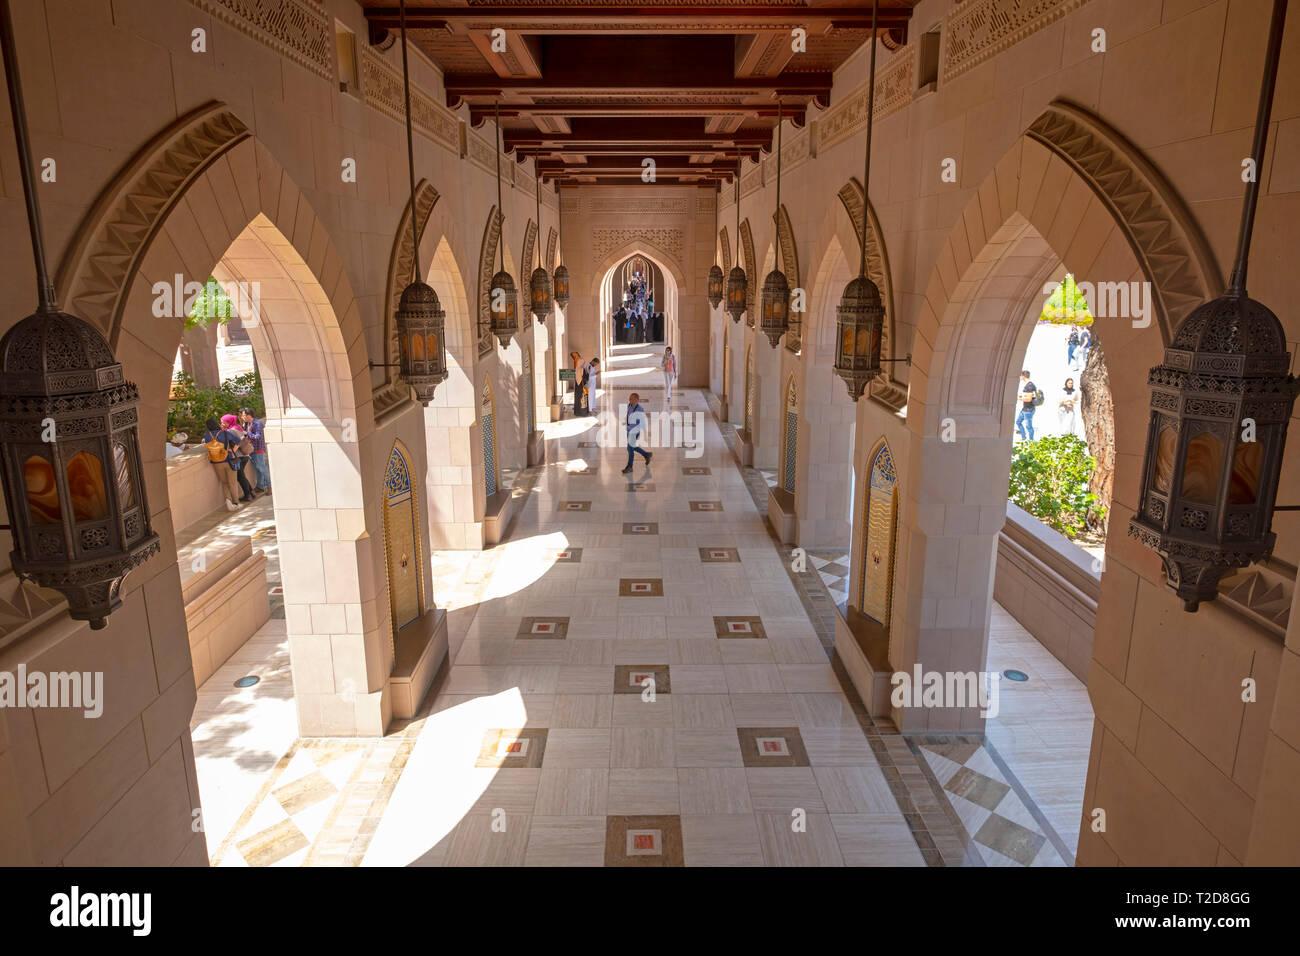 Sultan Qaboos Grand Mosque in Muscat, Oman Stockfoto